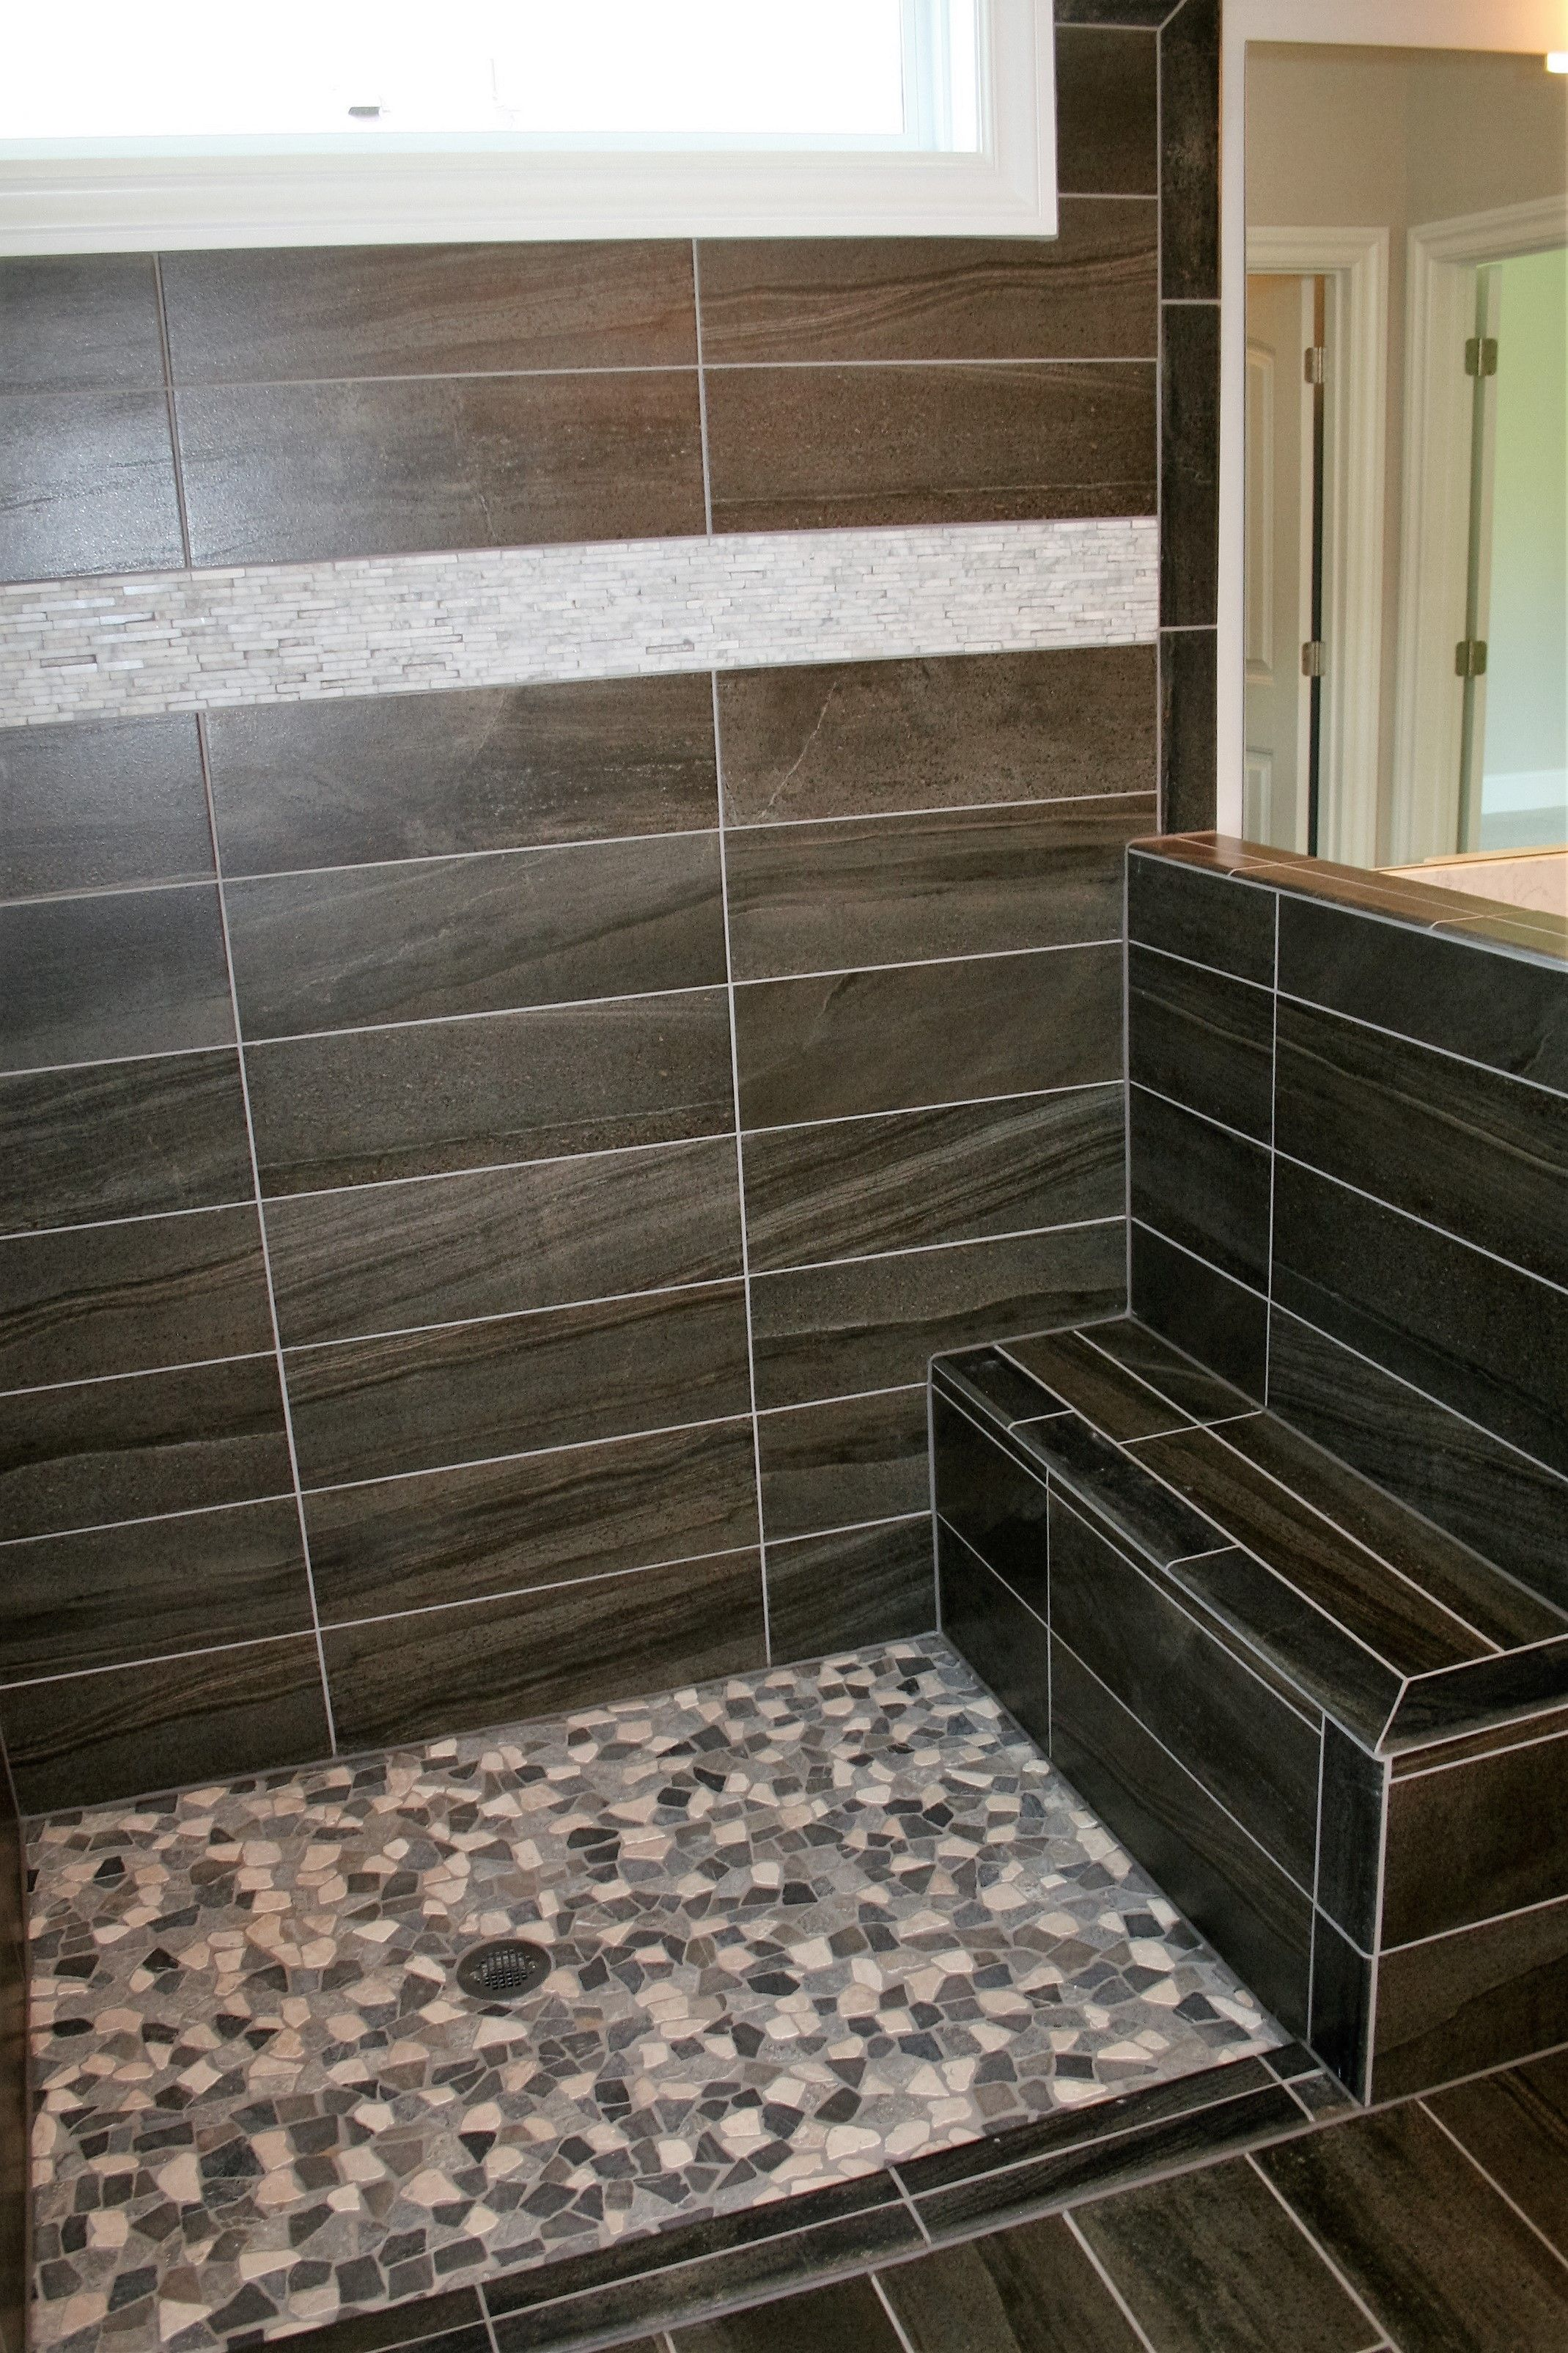 black to yellow rock buy glass and uk bathroom floor where for mosaic tile wall floors tiles river walls shower backsplash